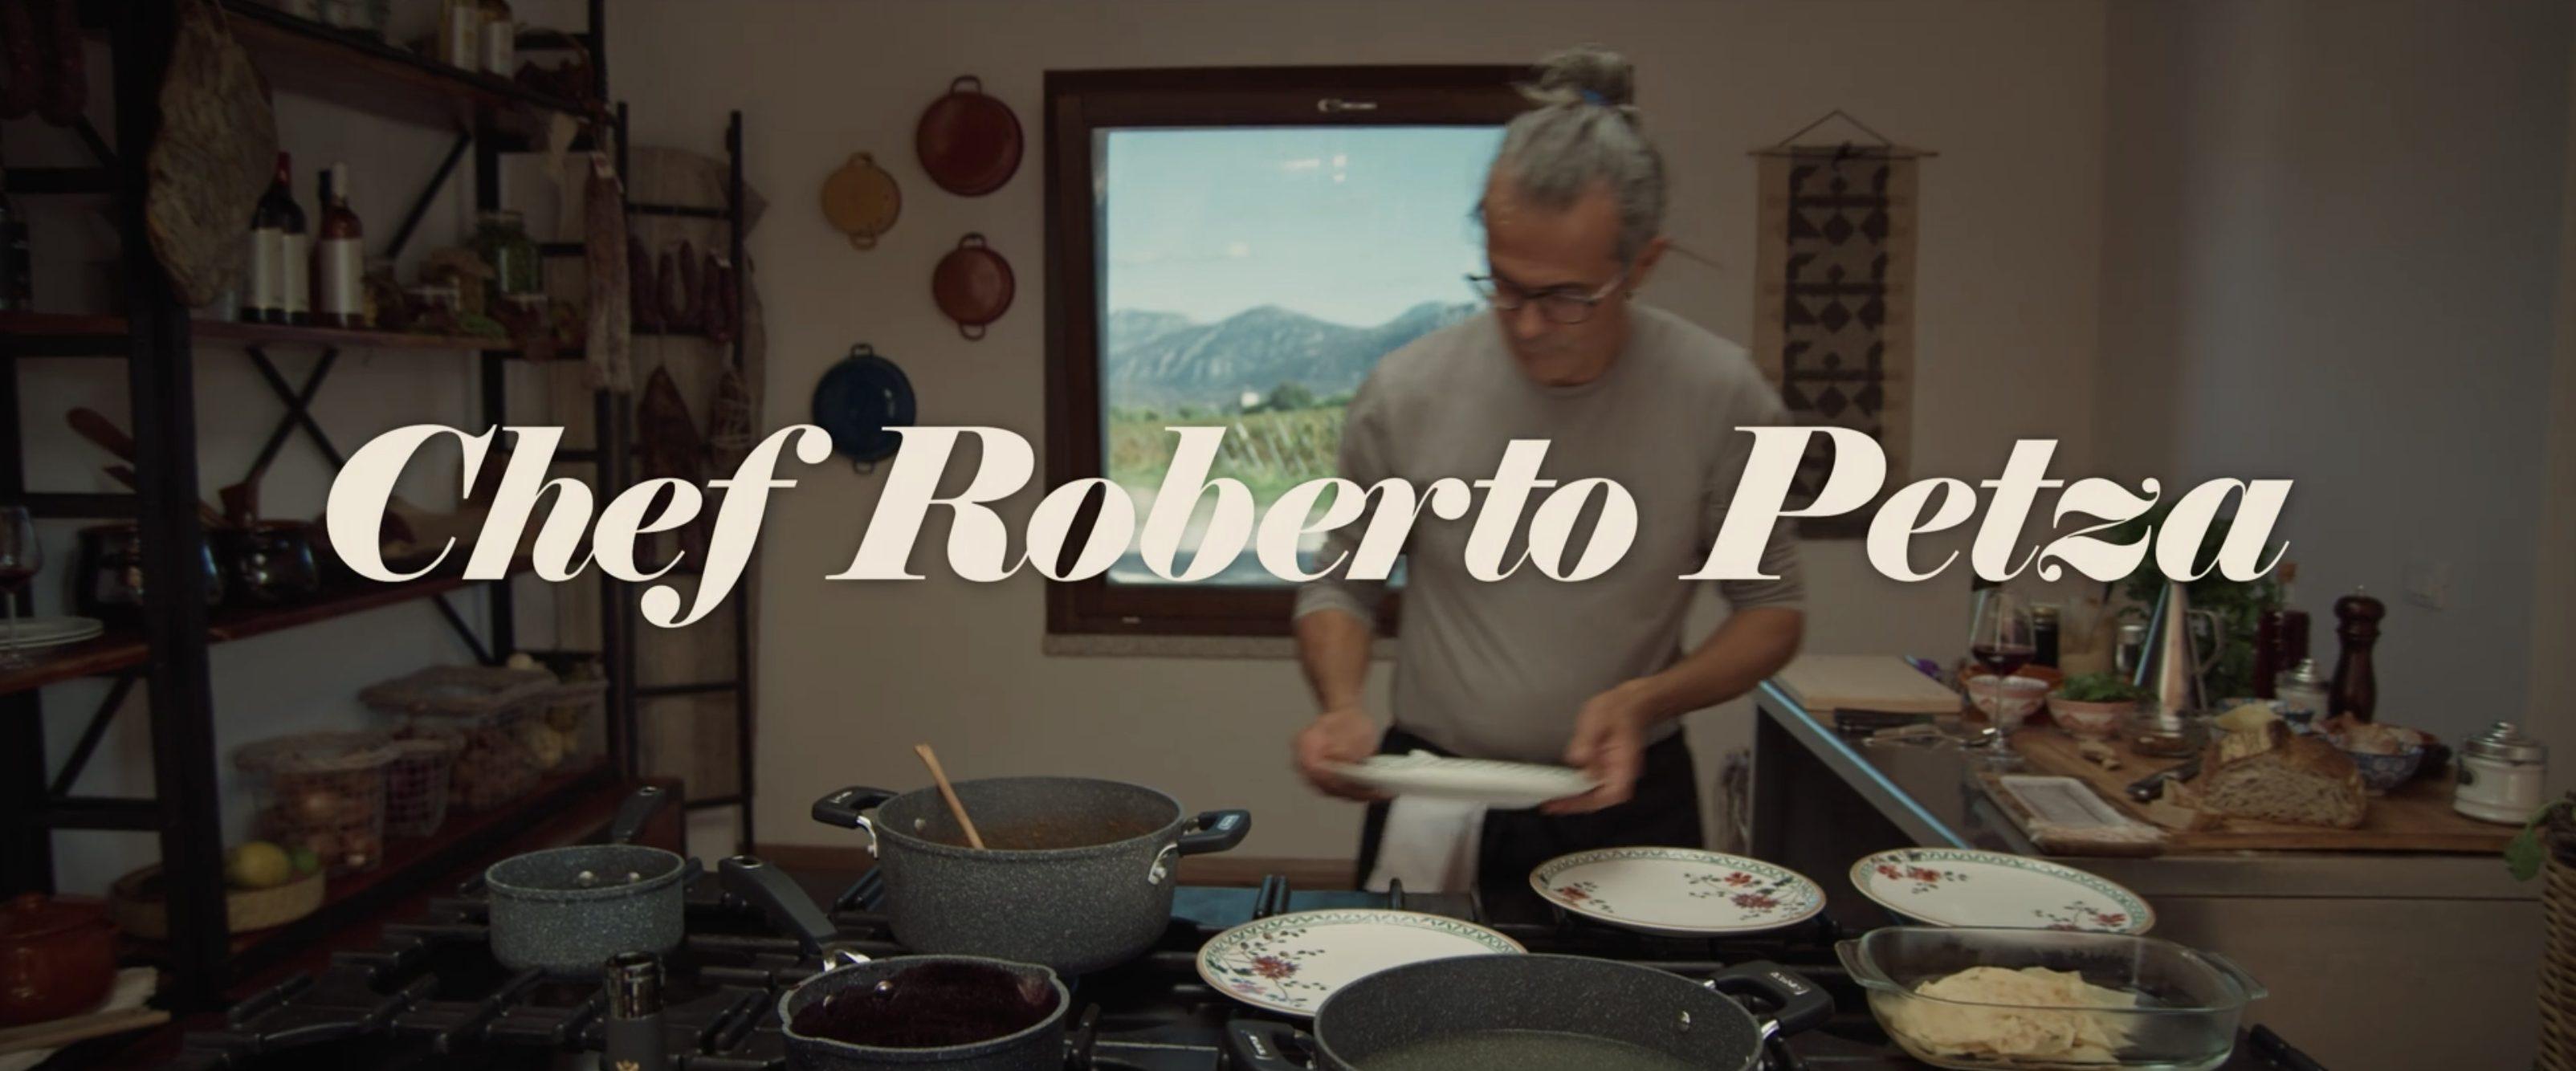 roberto-petza-dinner-club